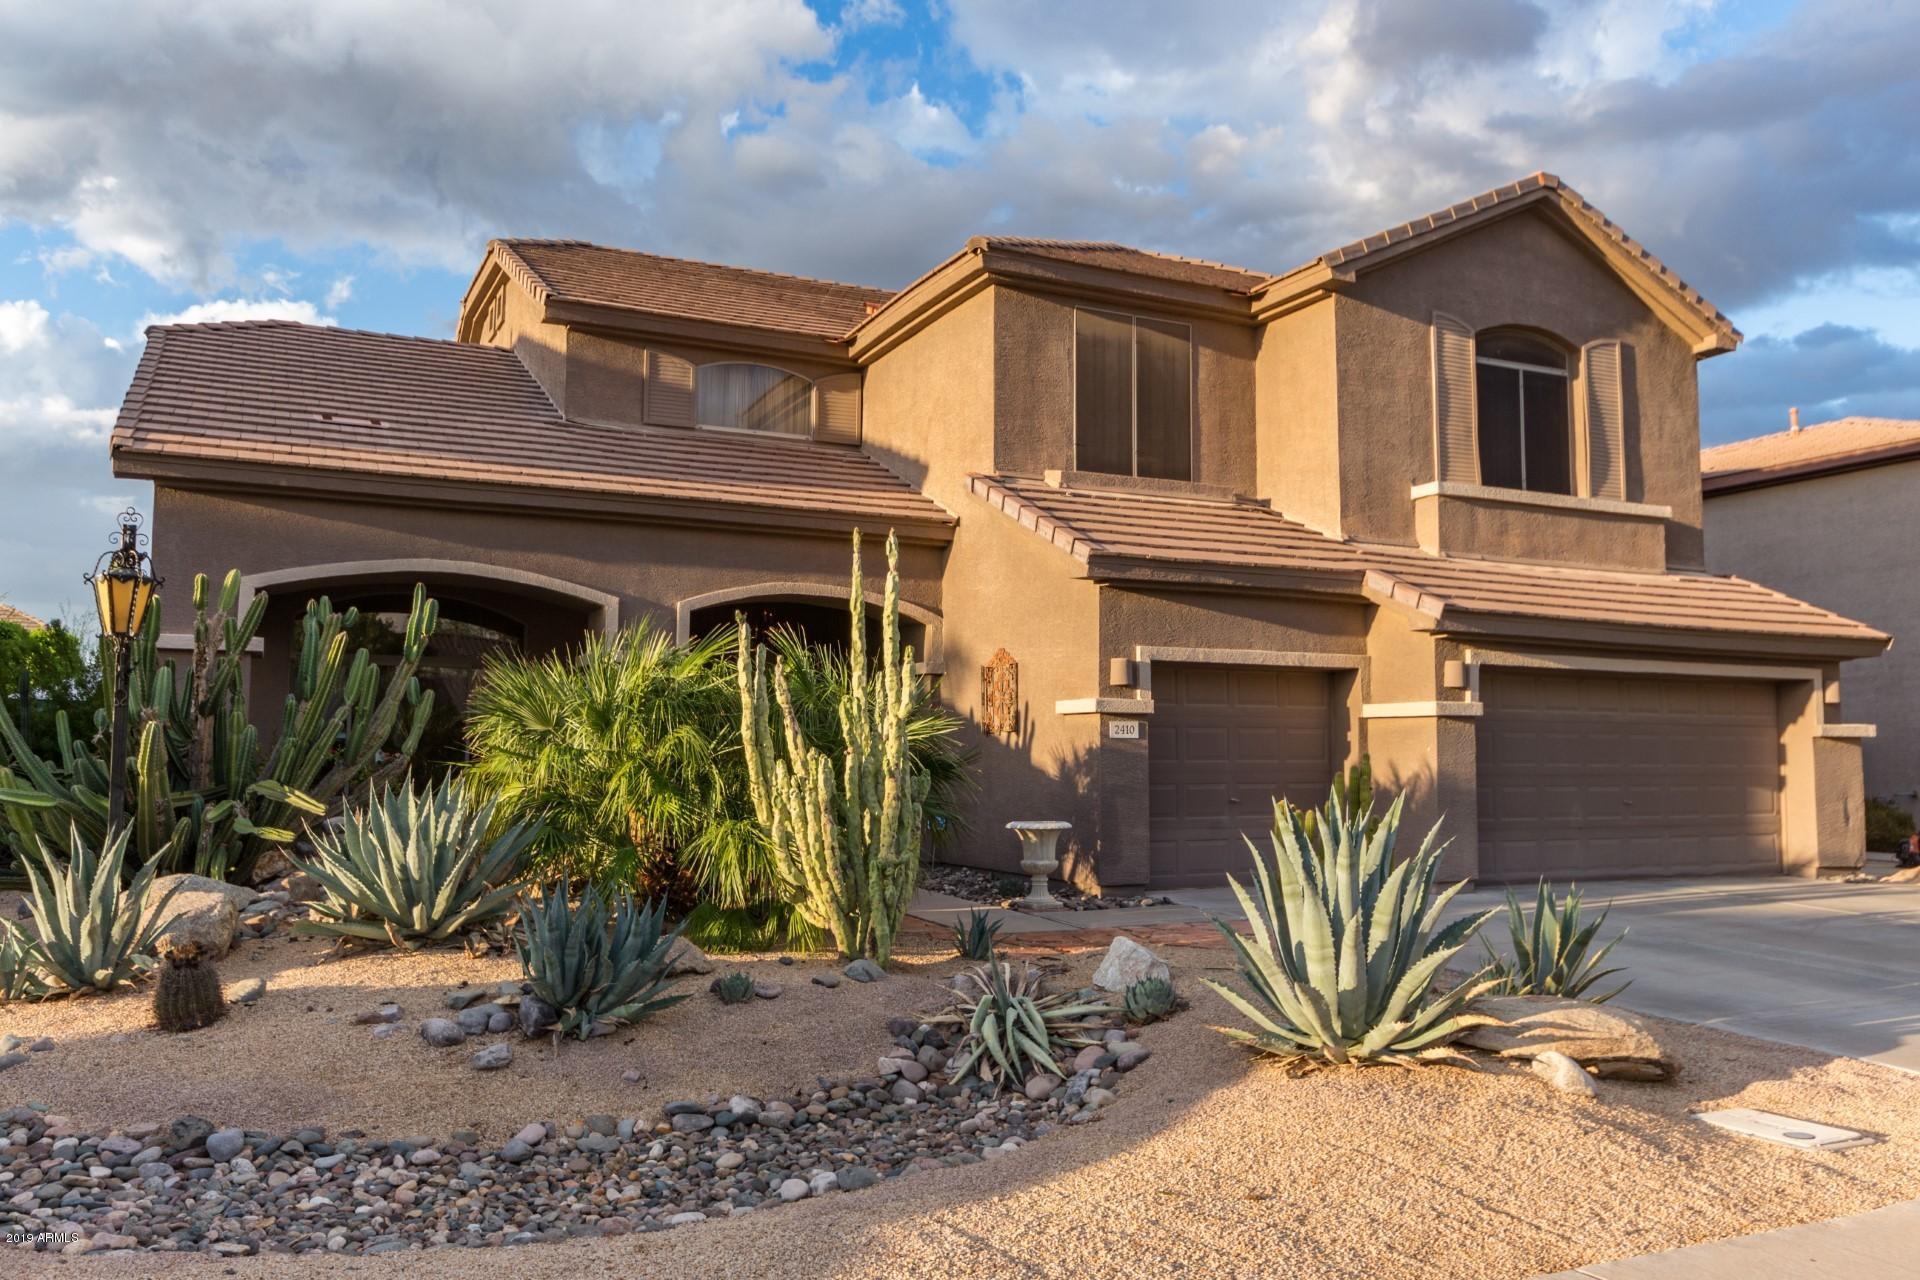 Photo of 2410 W MARLIN Drive, Chandler, AZ 85286